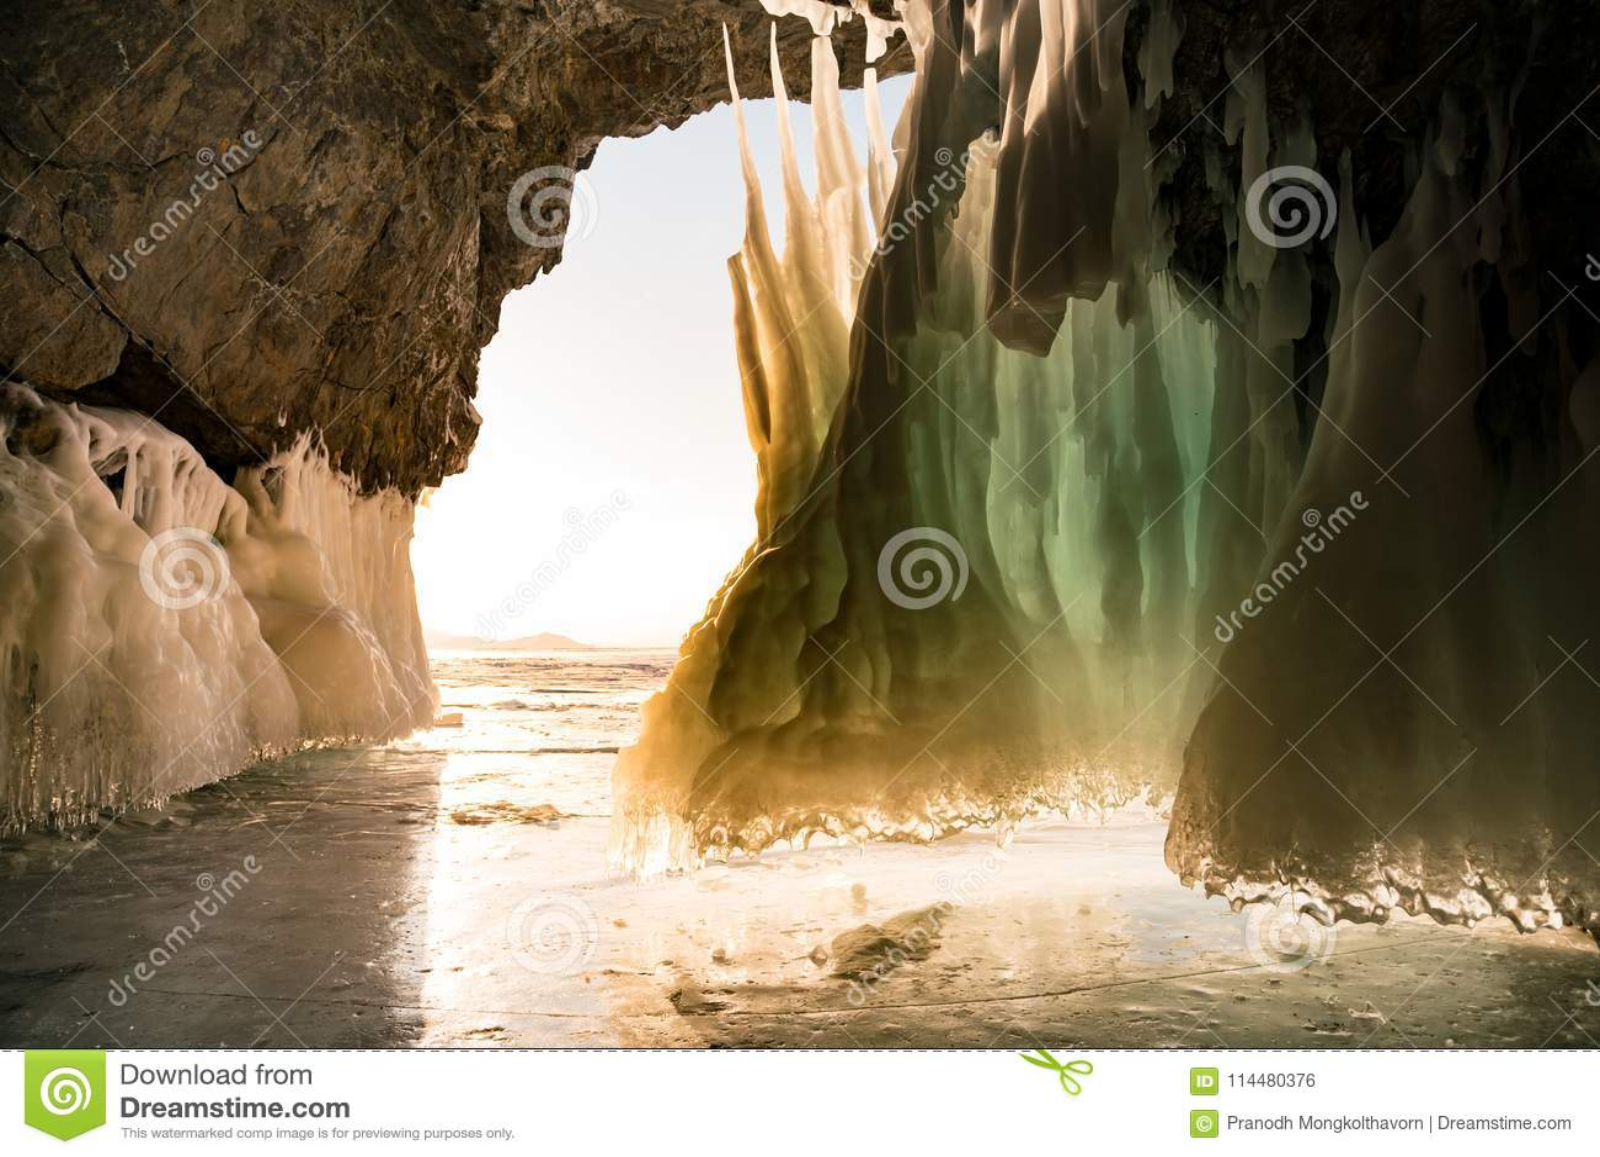 Ice cave in Baikal lake winter season